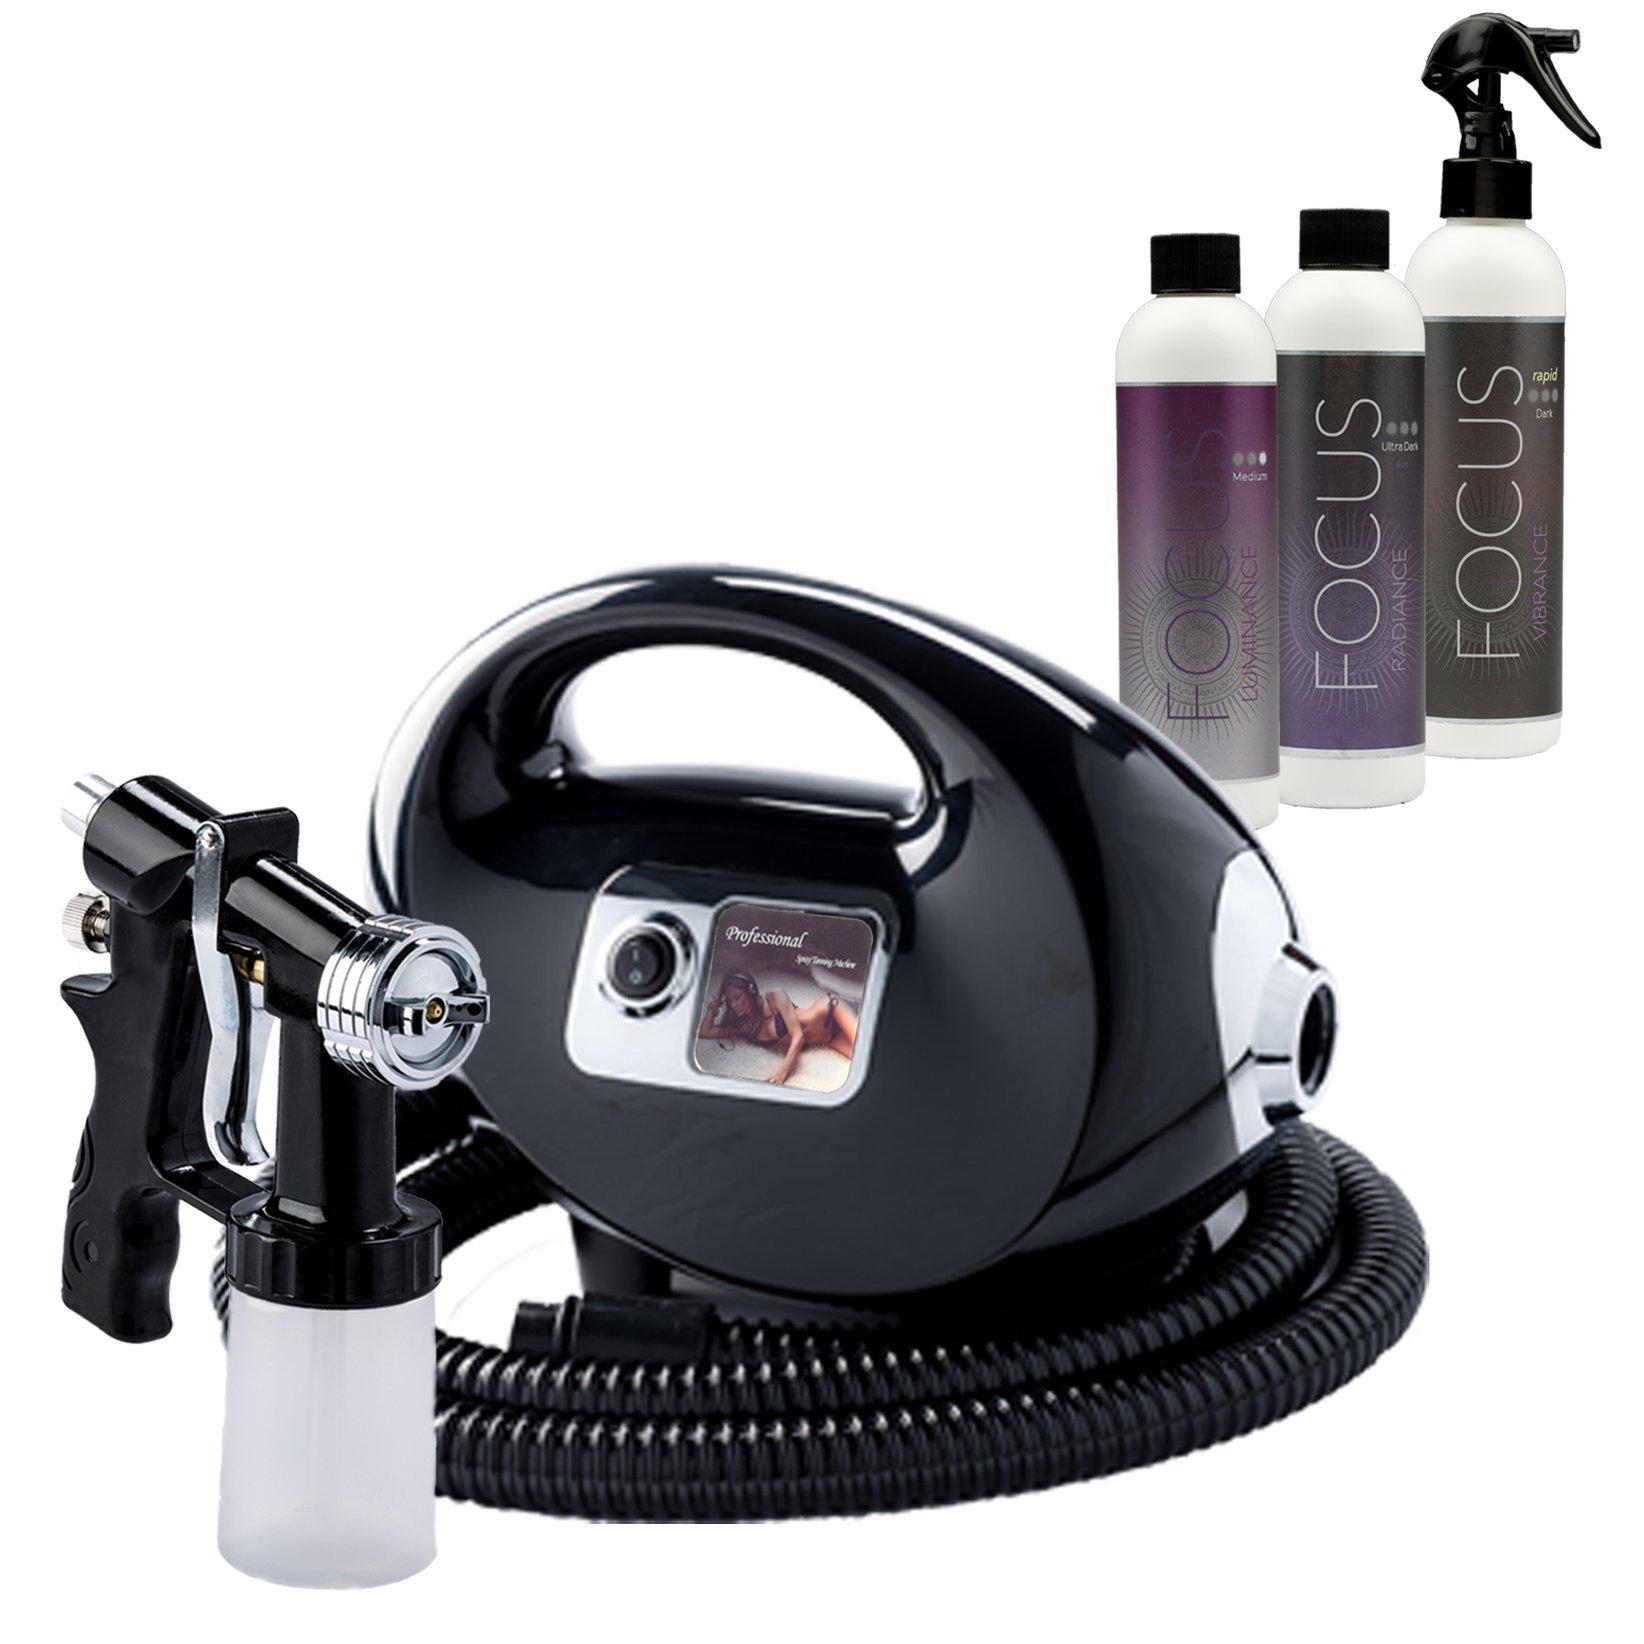 Fascination Spray Tanning Kit Machine Bundle with Tanning Solution(Black)